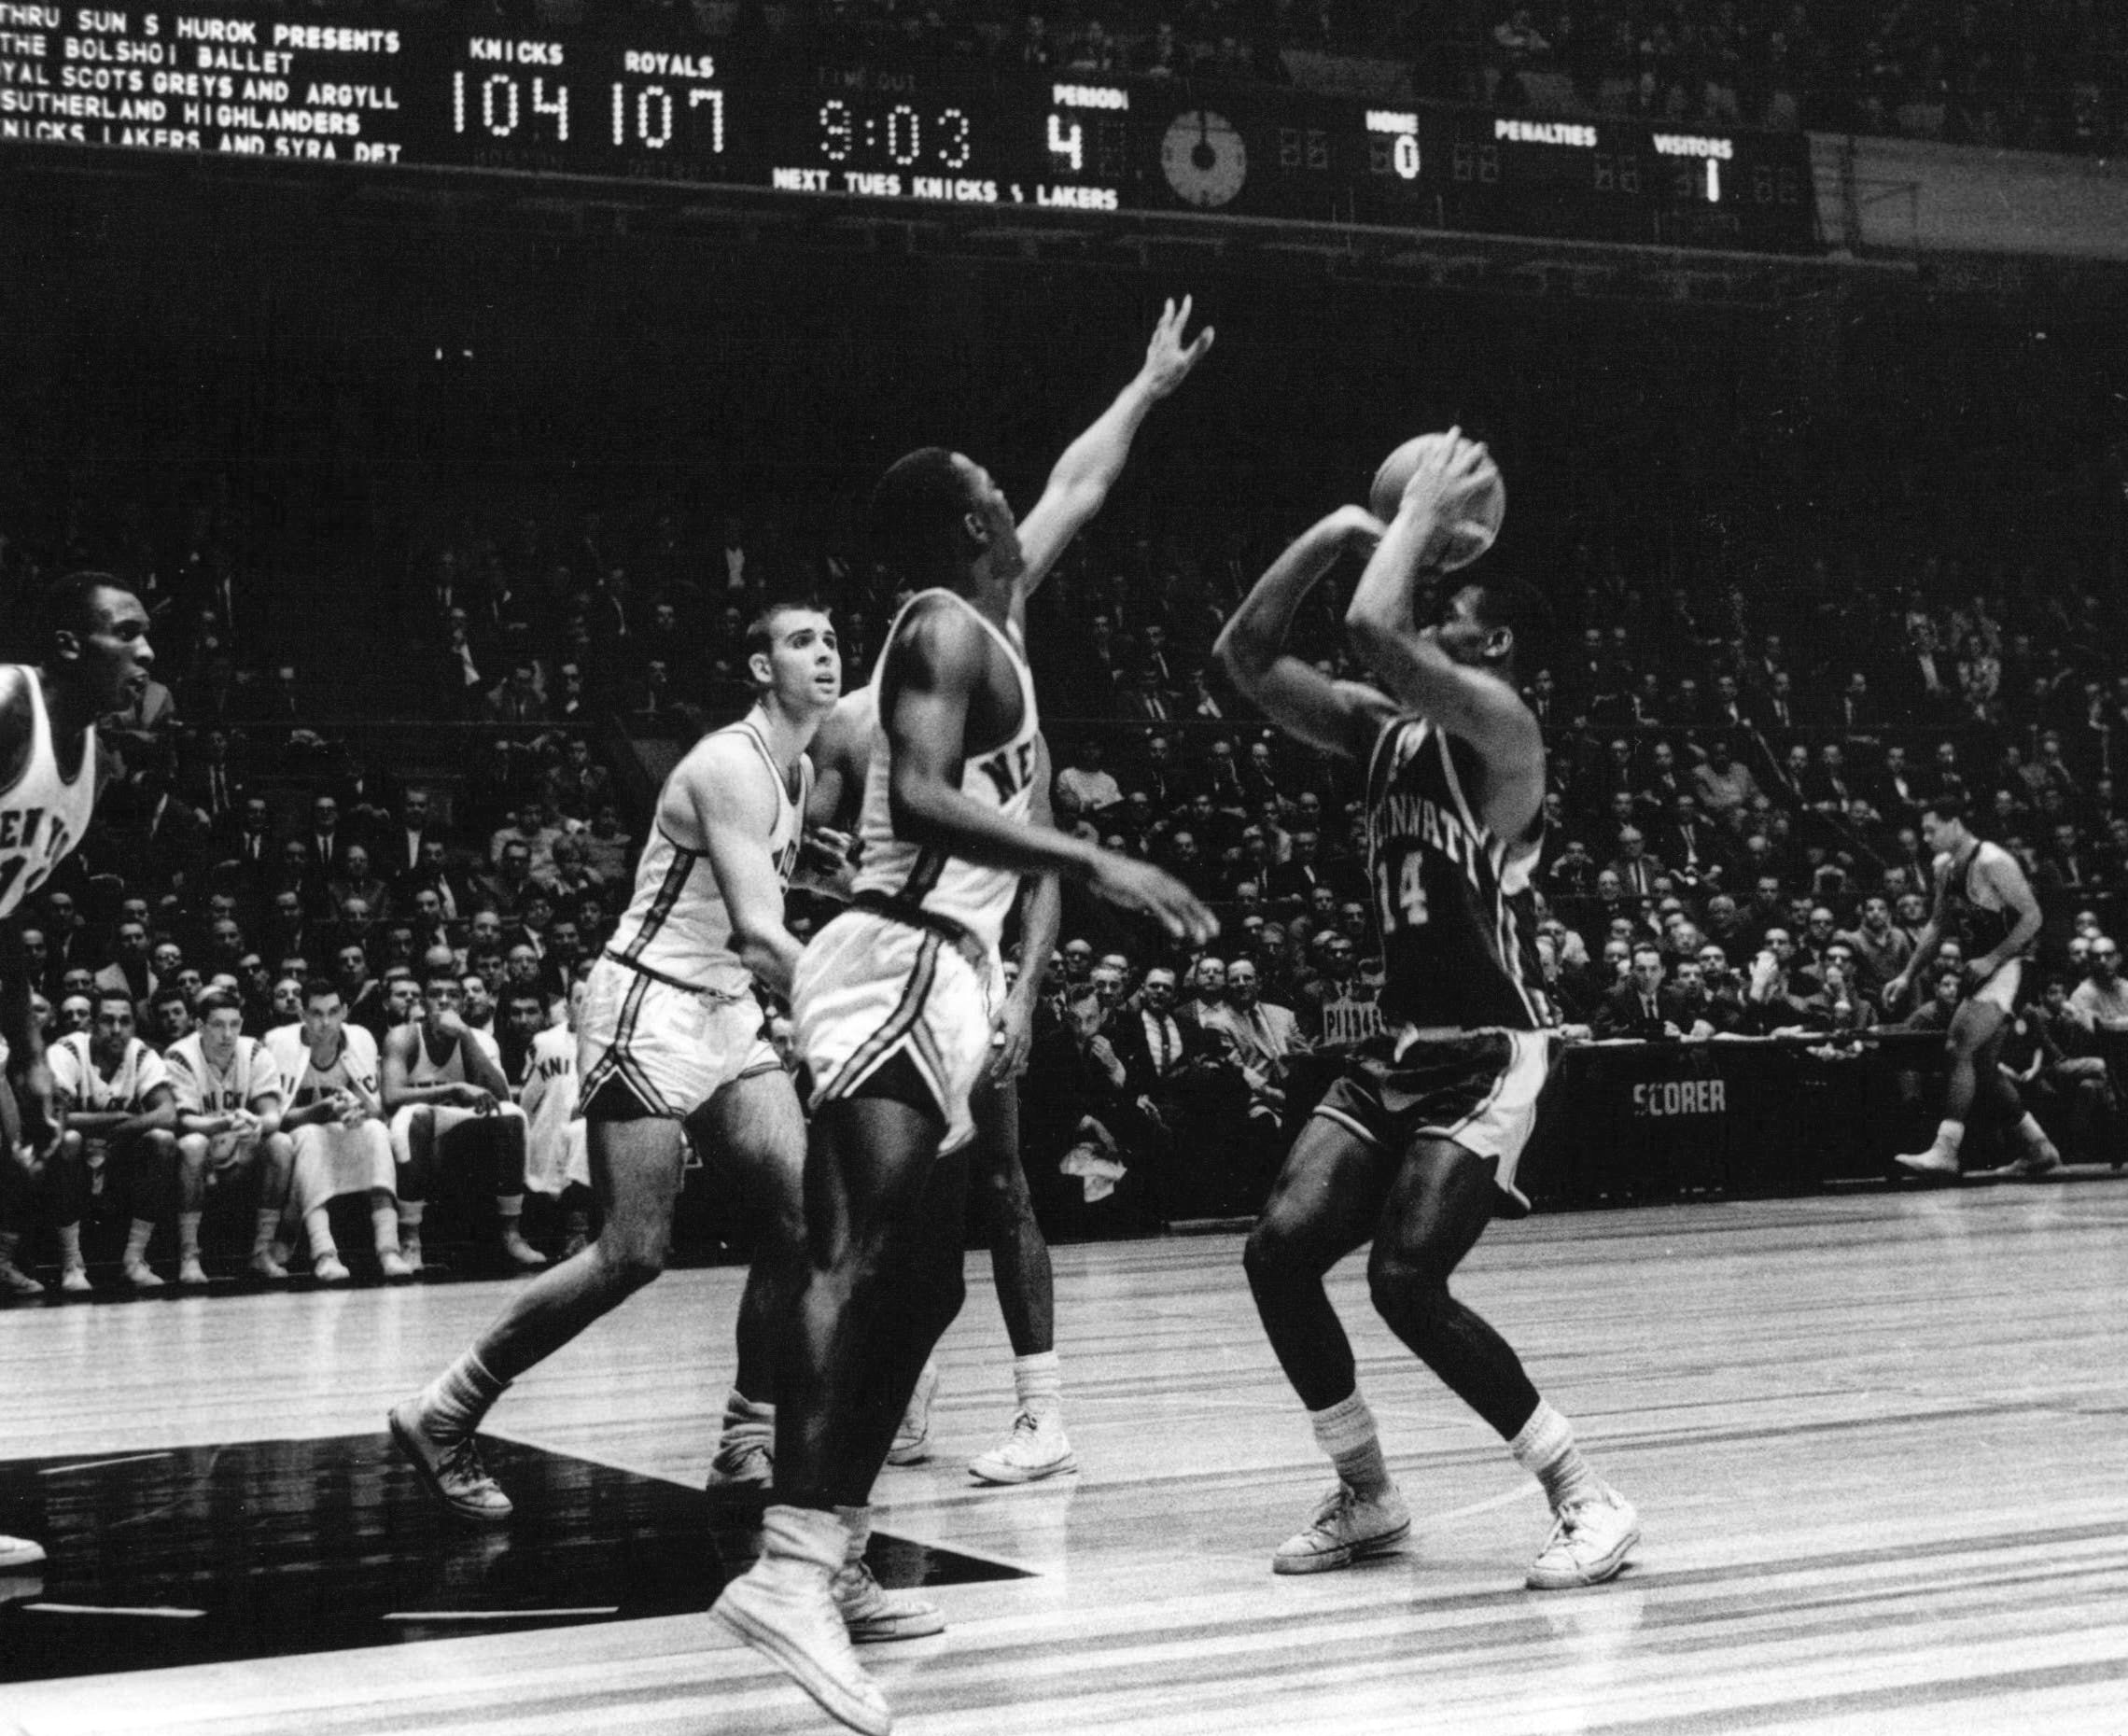 File Oscar Robertson Royals vs Knicks Wikimedia mons